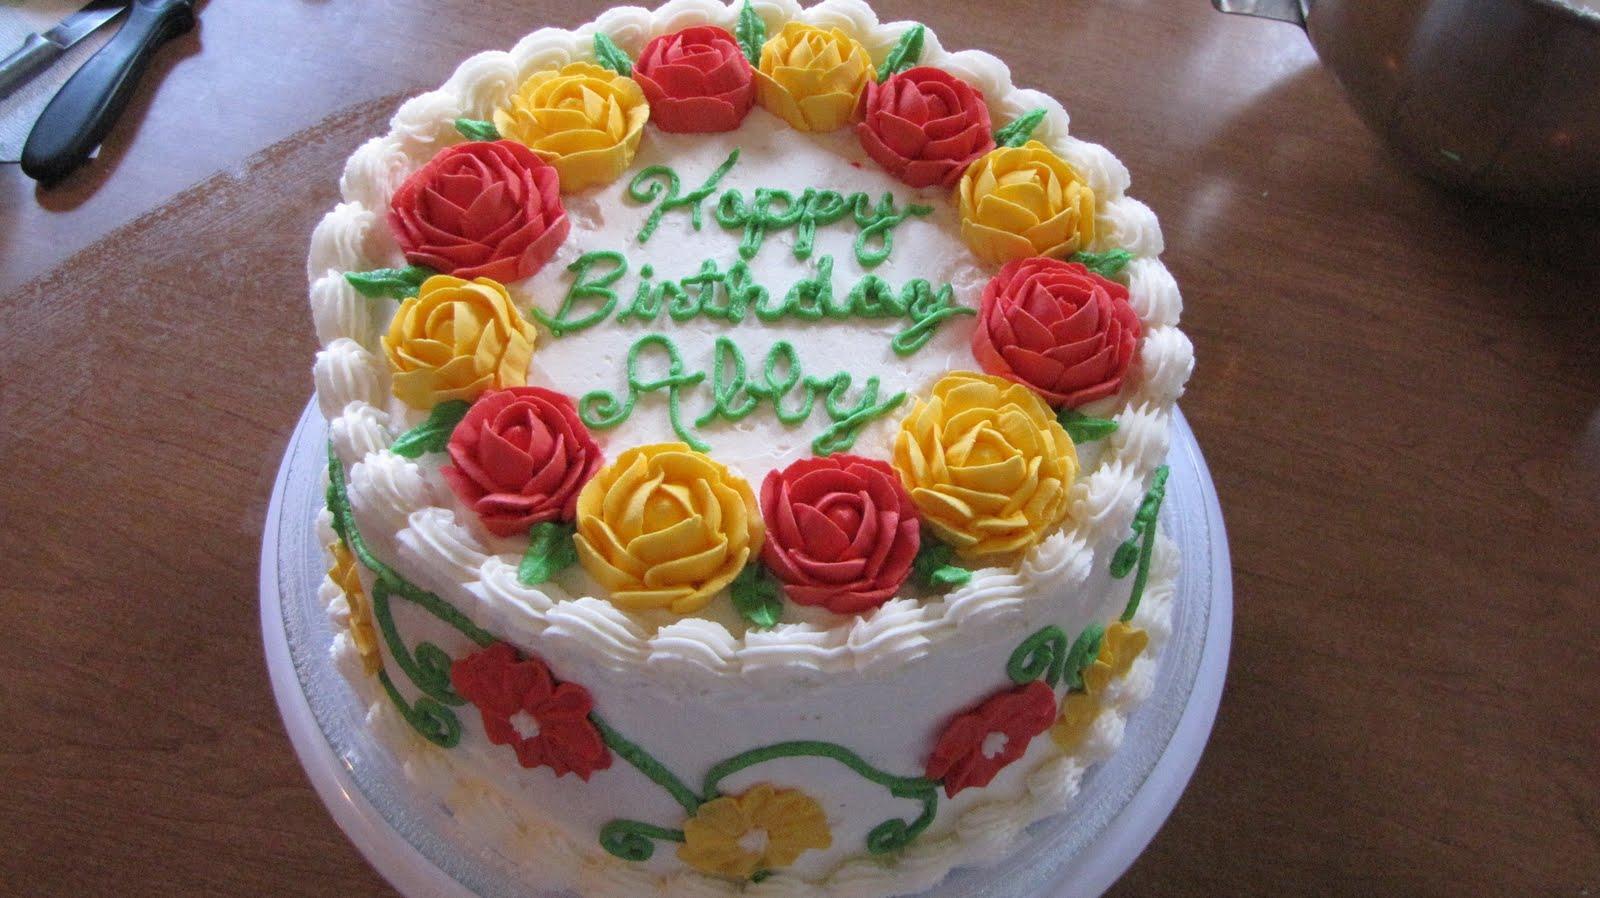 Birthday Party Ideas Karaoke Image Inspiration of Cake and